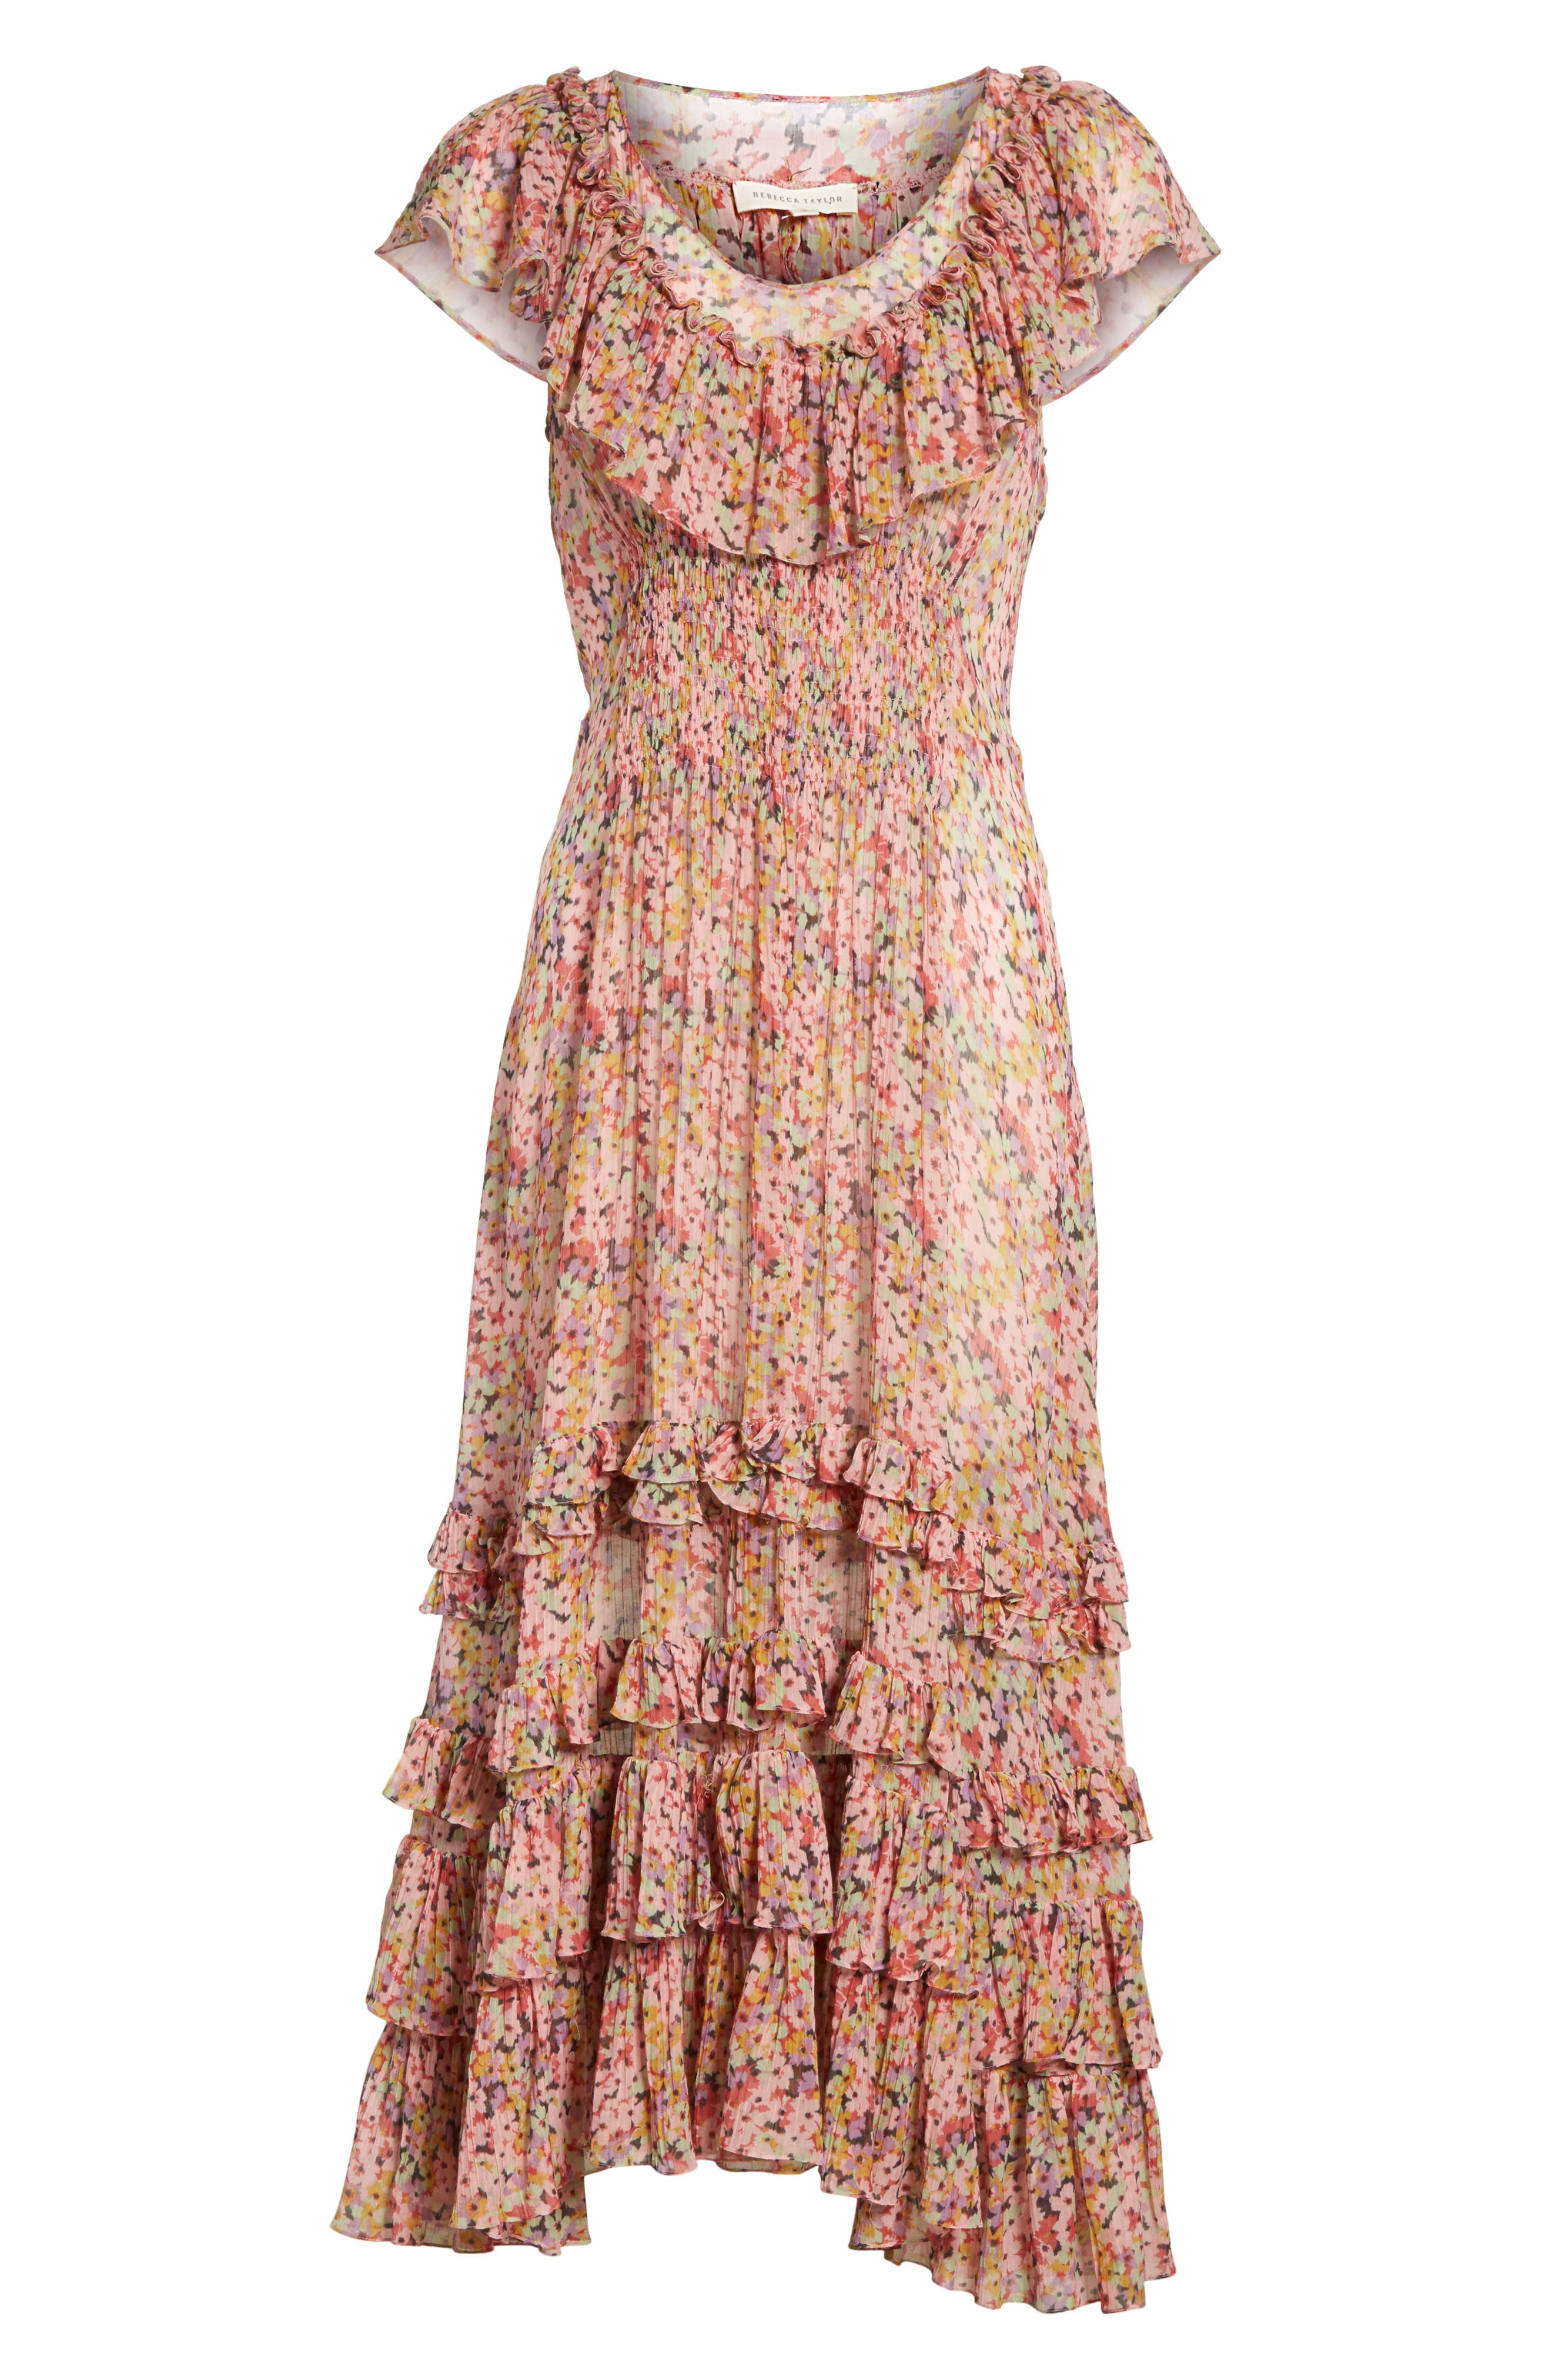 Margo Floral Ruffled Midi Dress,                             Alternate thumbnail 6, color,                             686